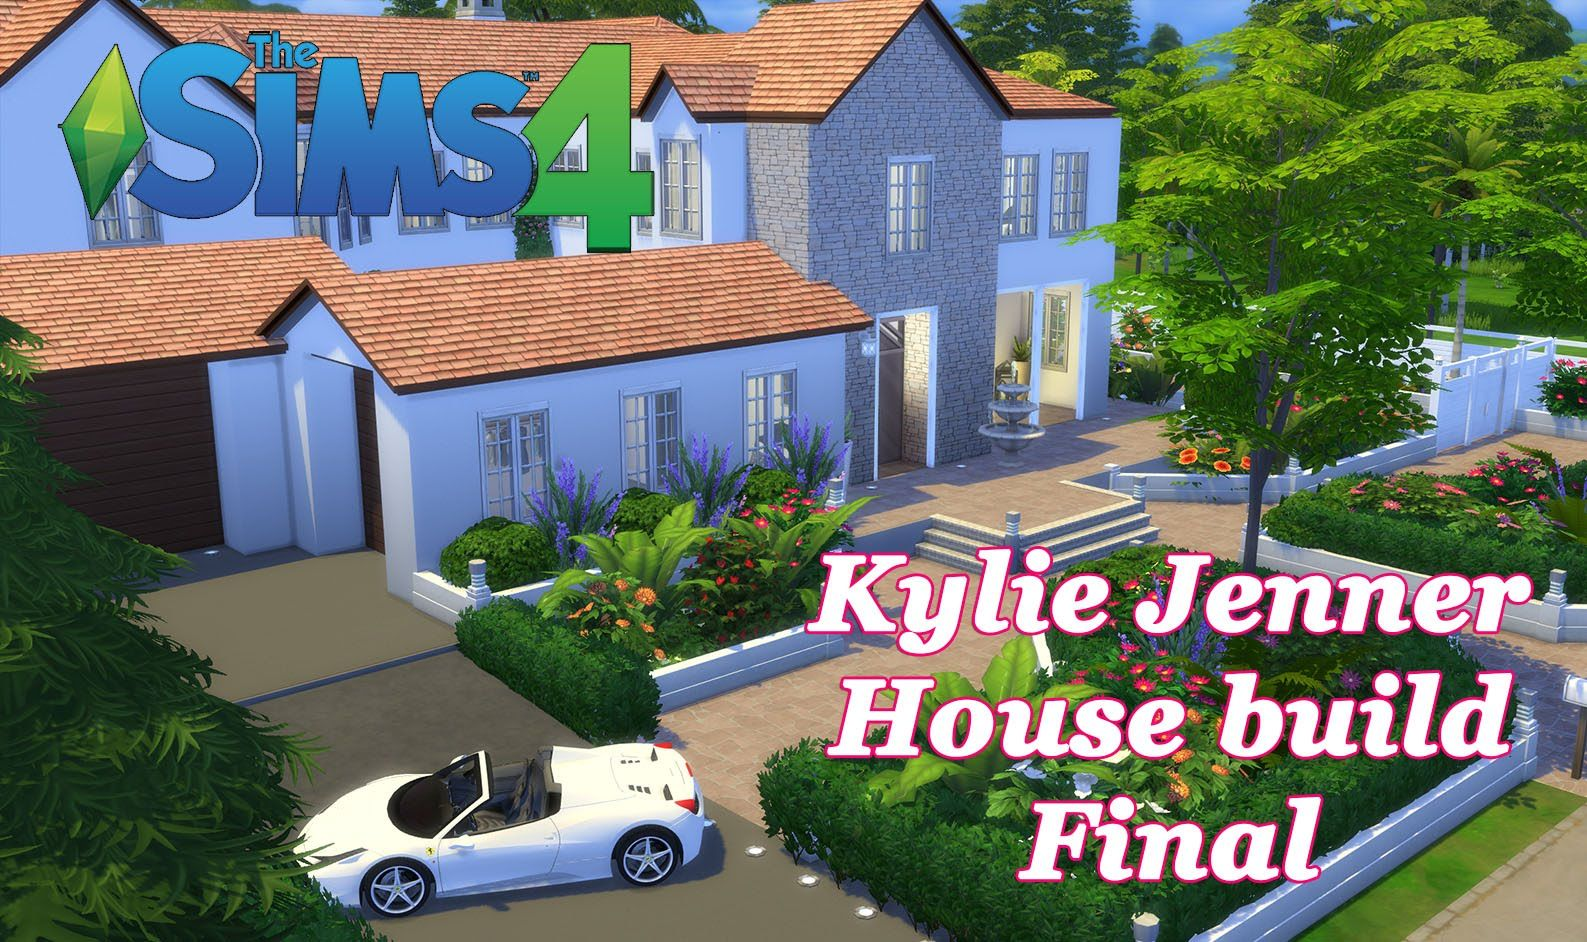 The Sims 4   Kylie Jenner House Build CC   House Tour  Final. The Sims 4   Kylie Jenner House Build CC   House Tour  Final